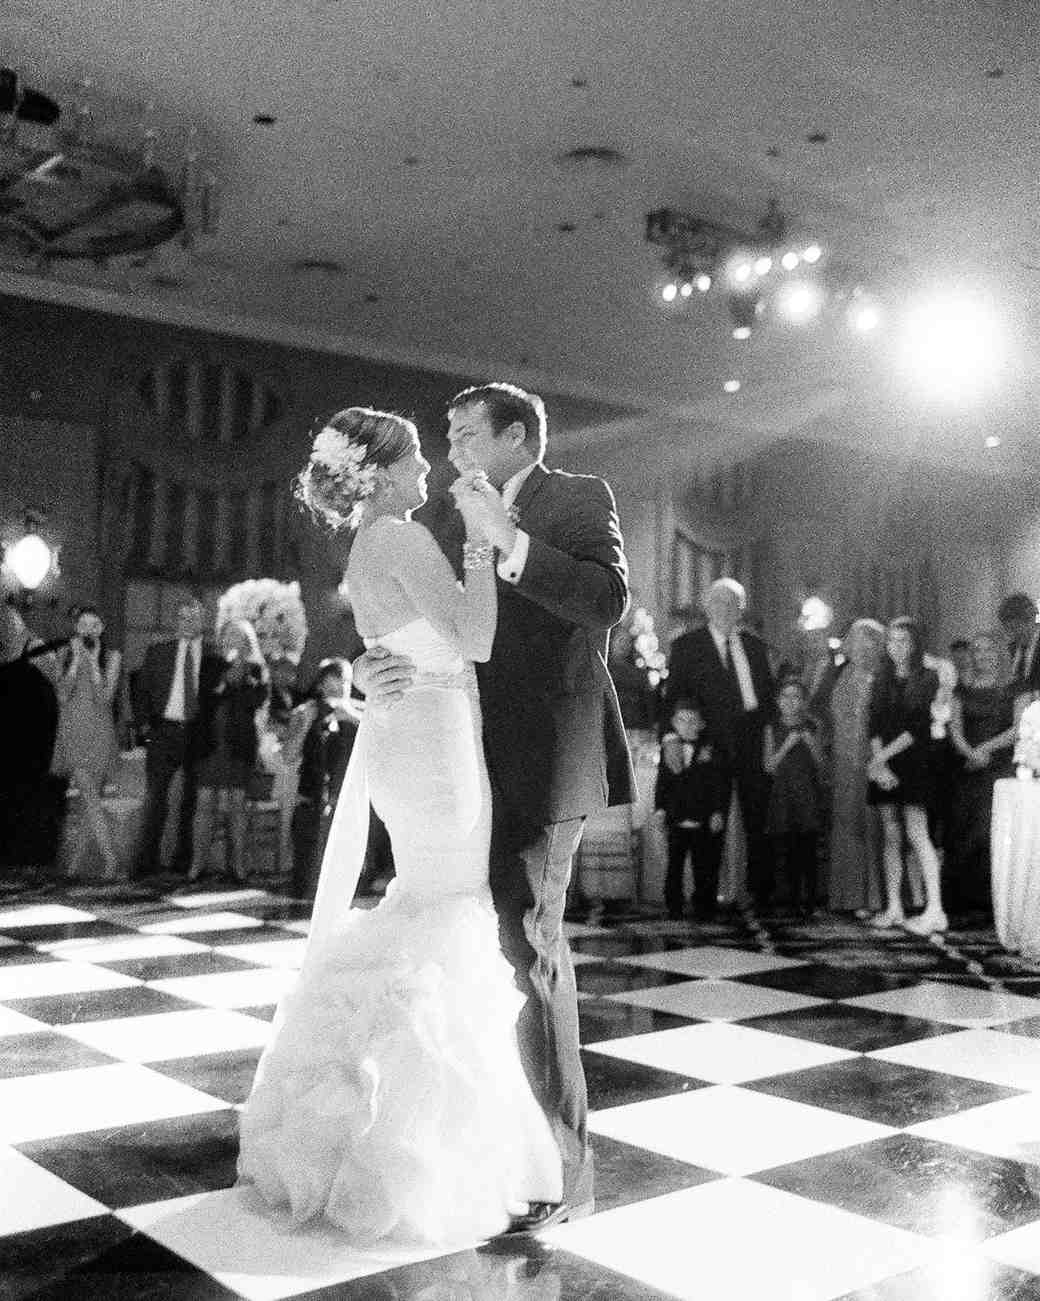 paige-michael-wedding-firstdance-1019-s112431-1215.jpg